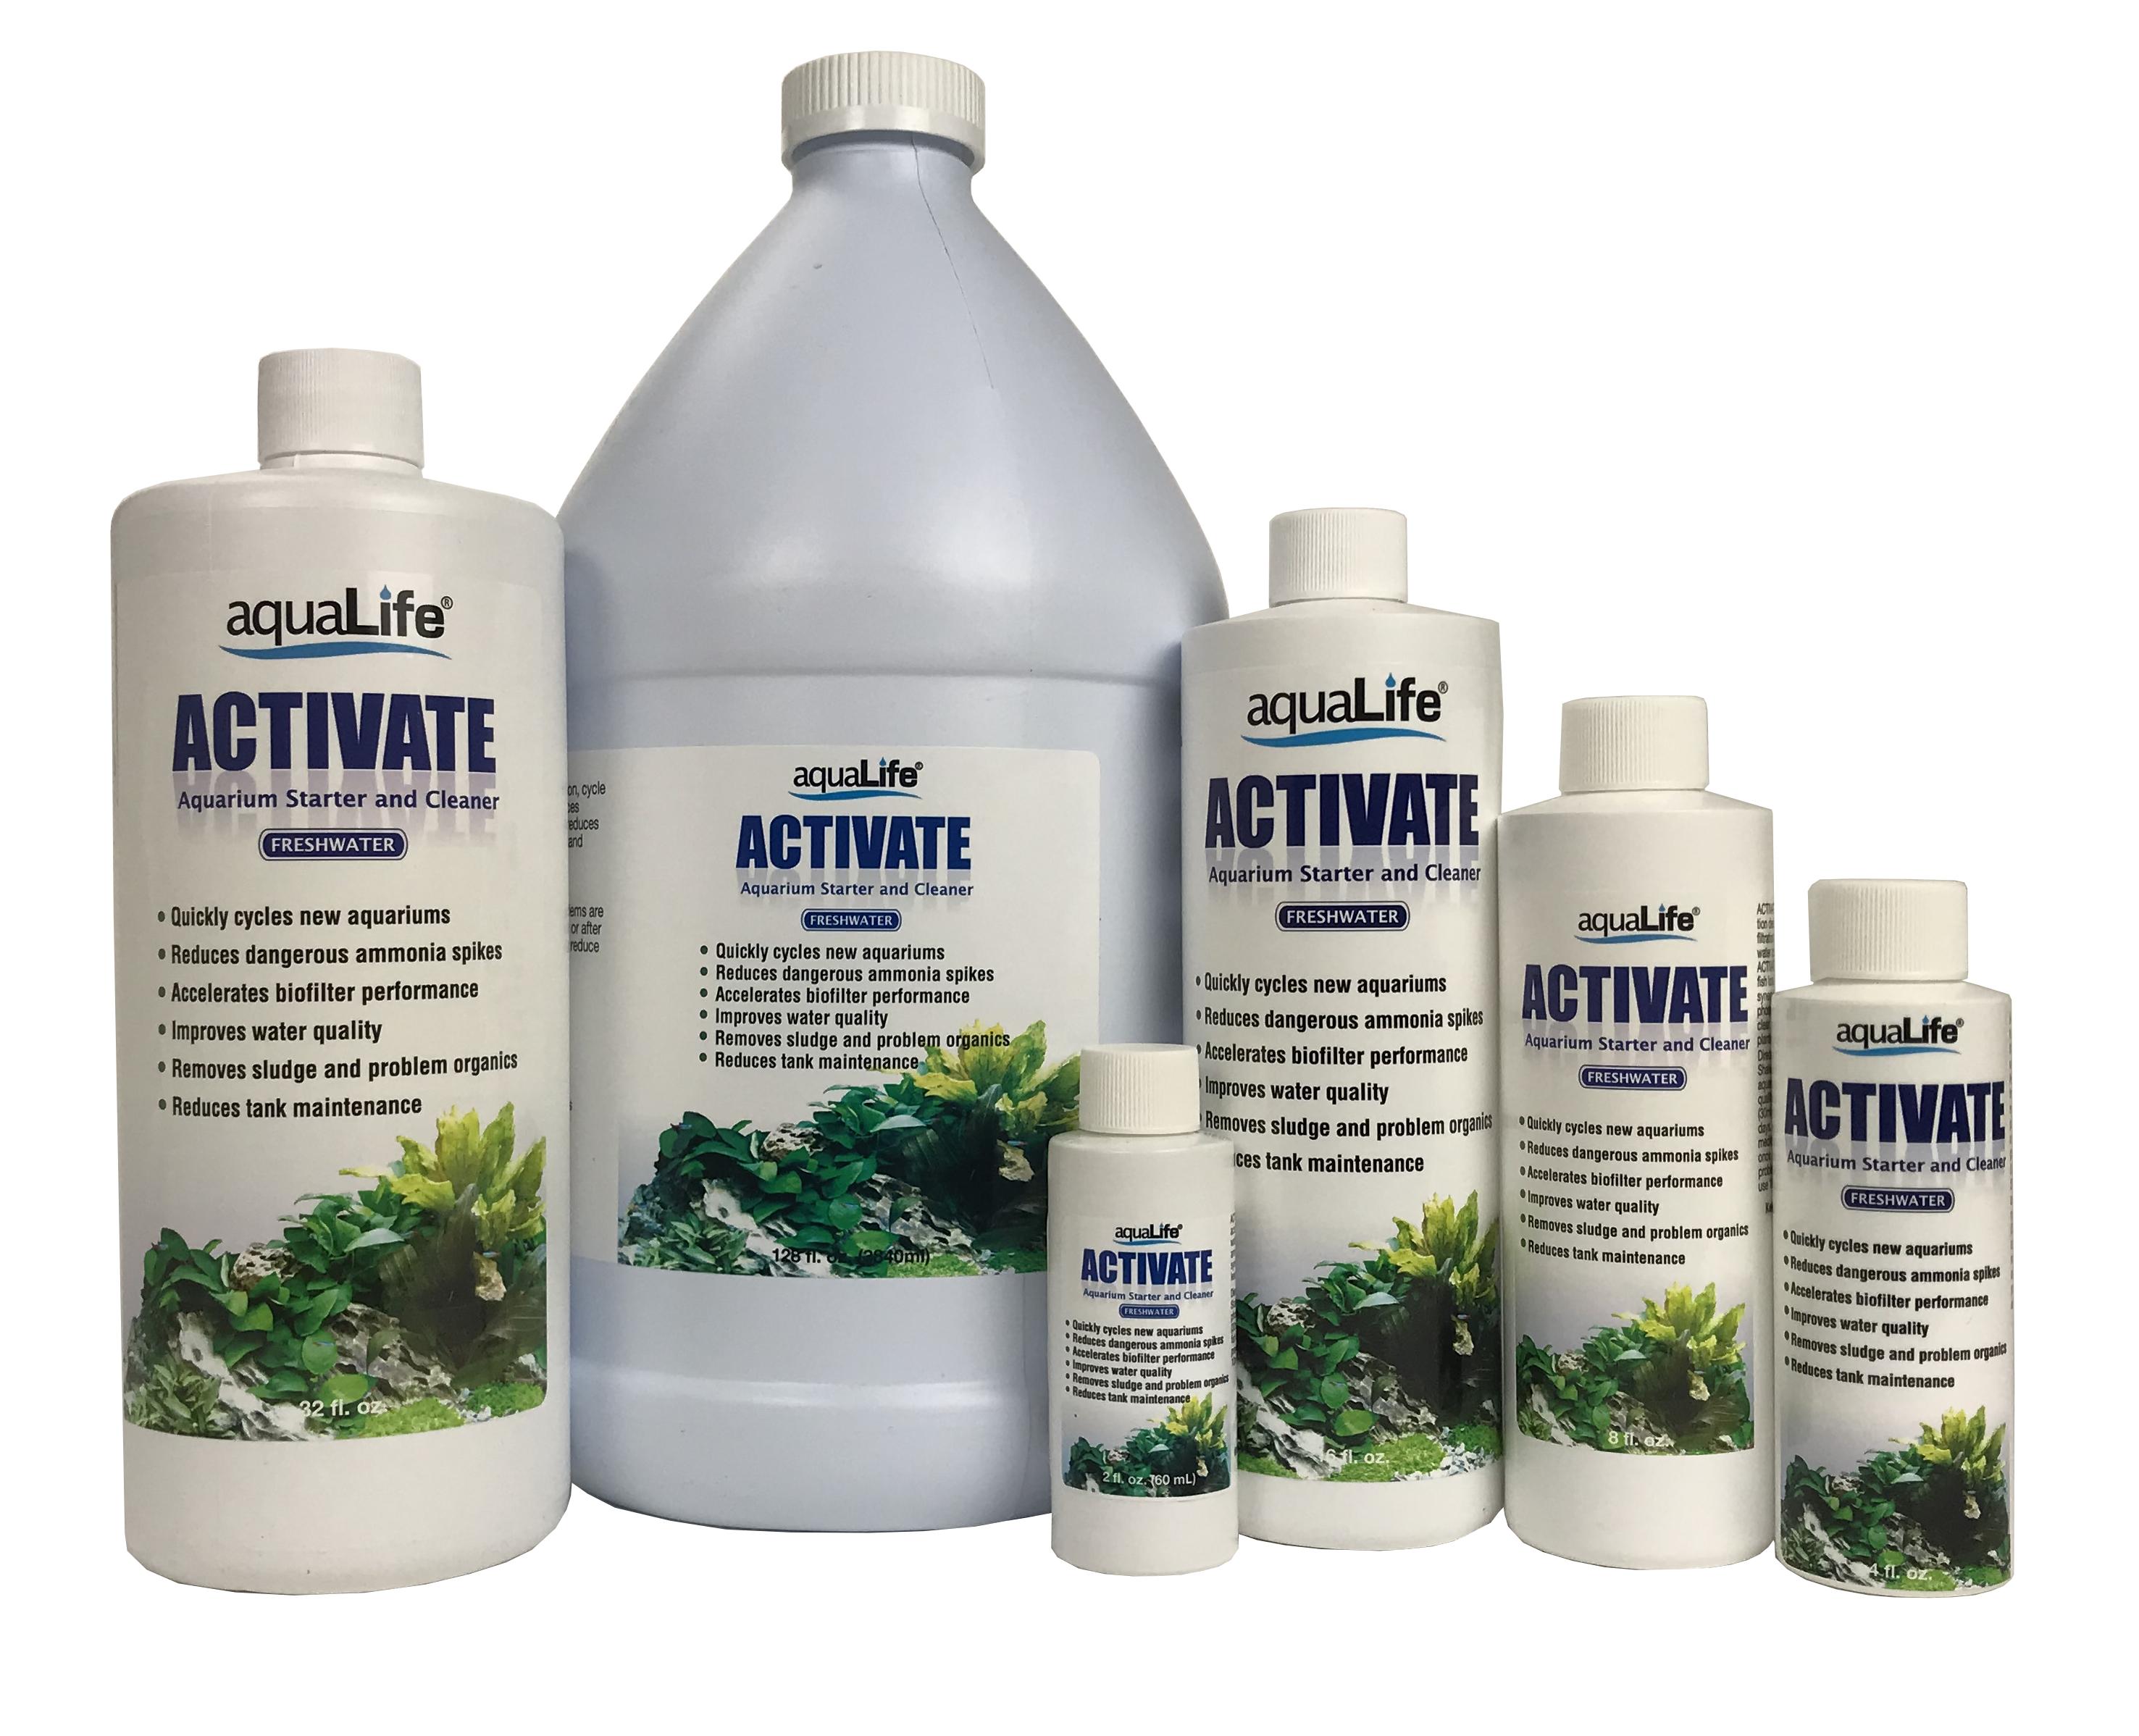 Activate Freshwater 4 oz Aquarium Starter and Cleaner